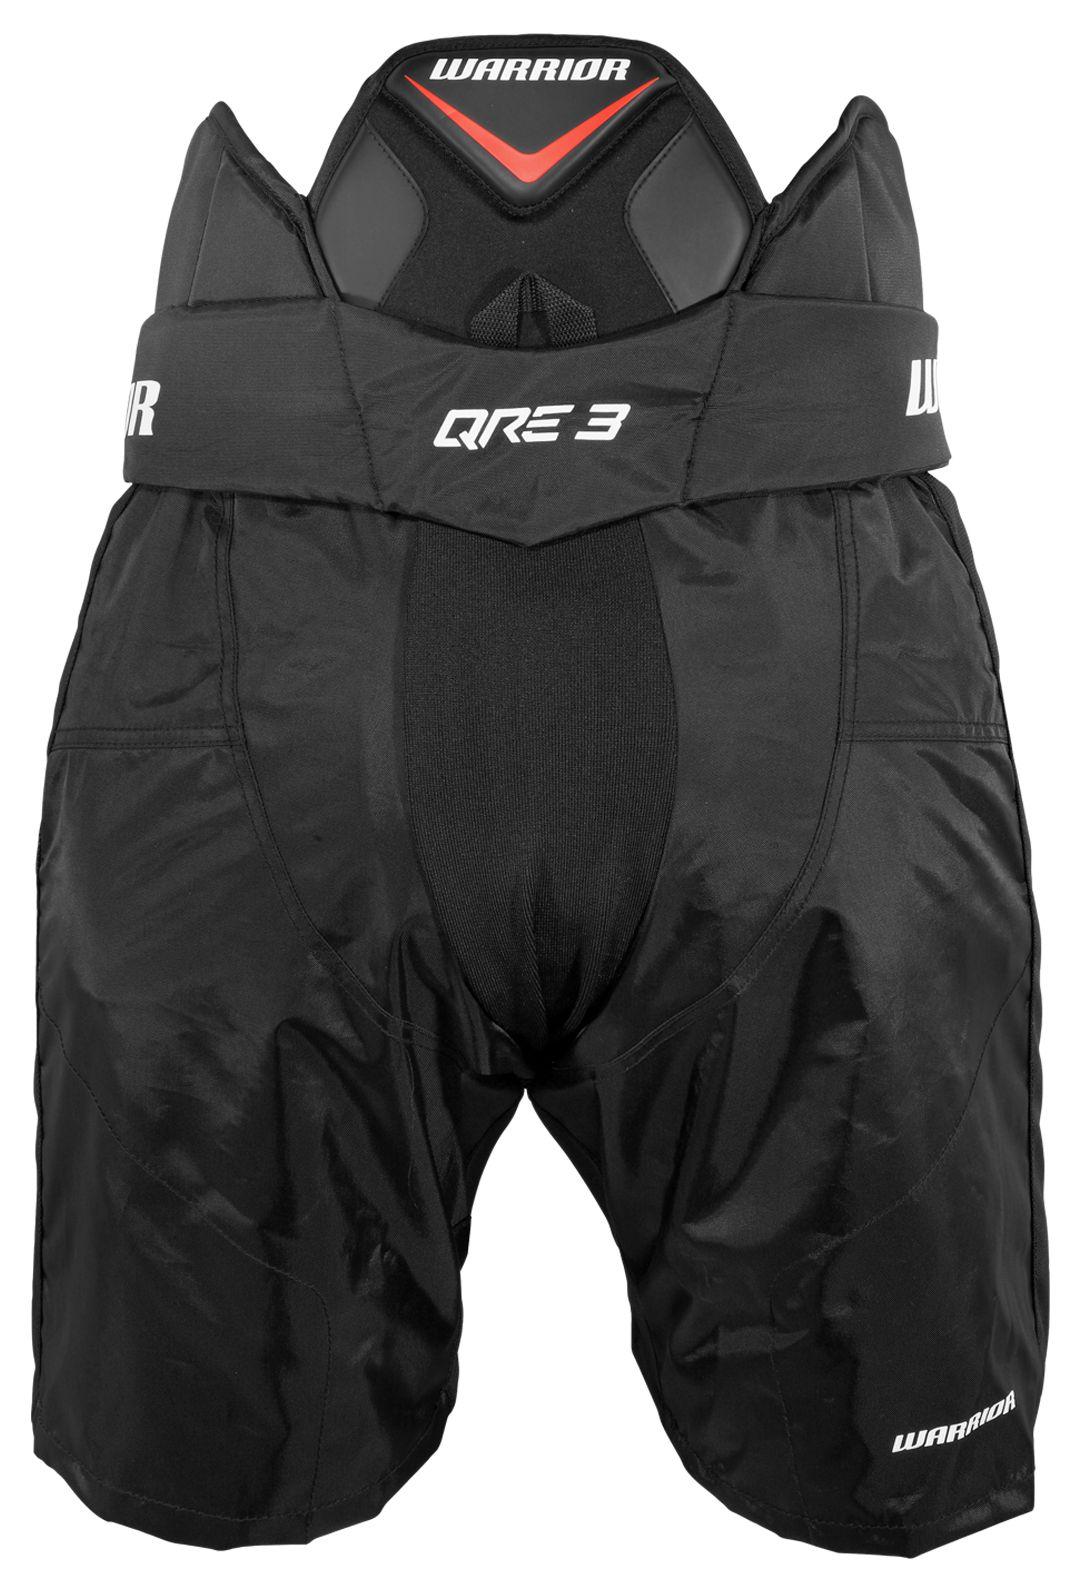 Warrior Junior Covert QRE3 Ice Hockey Pants